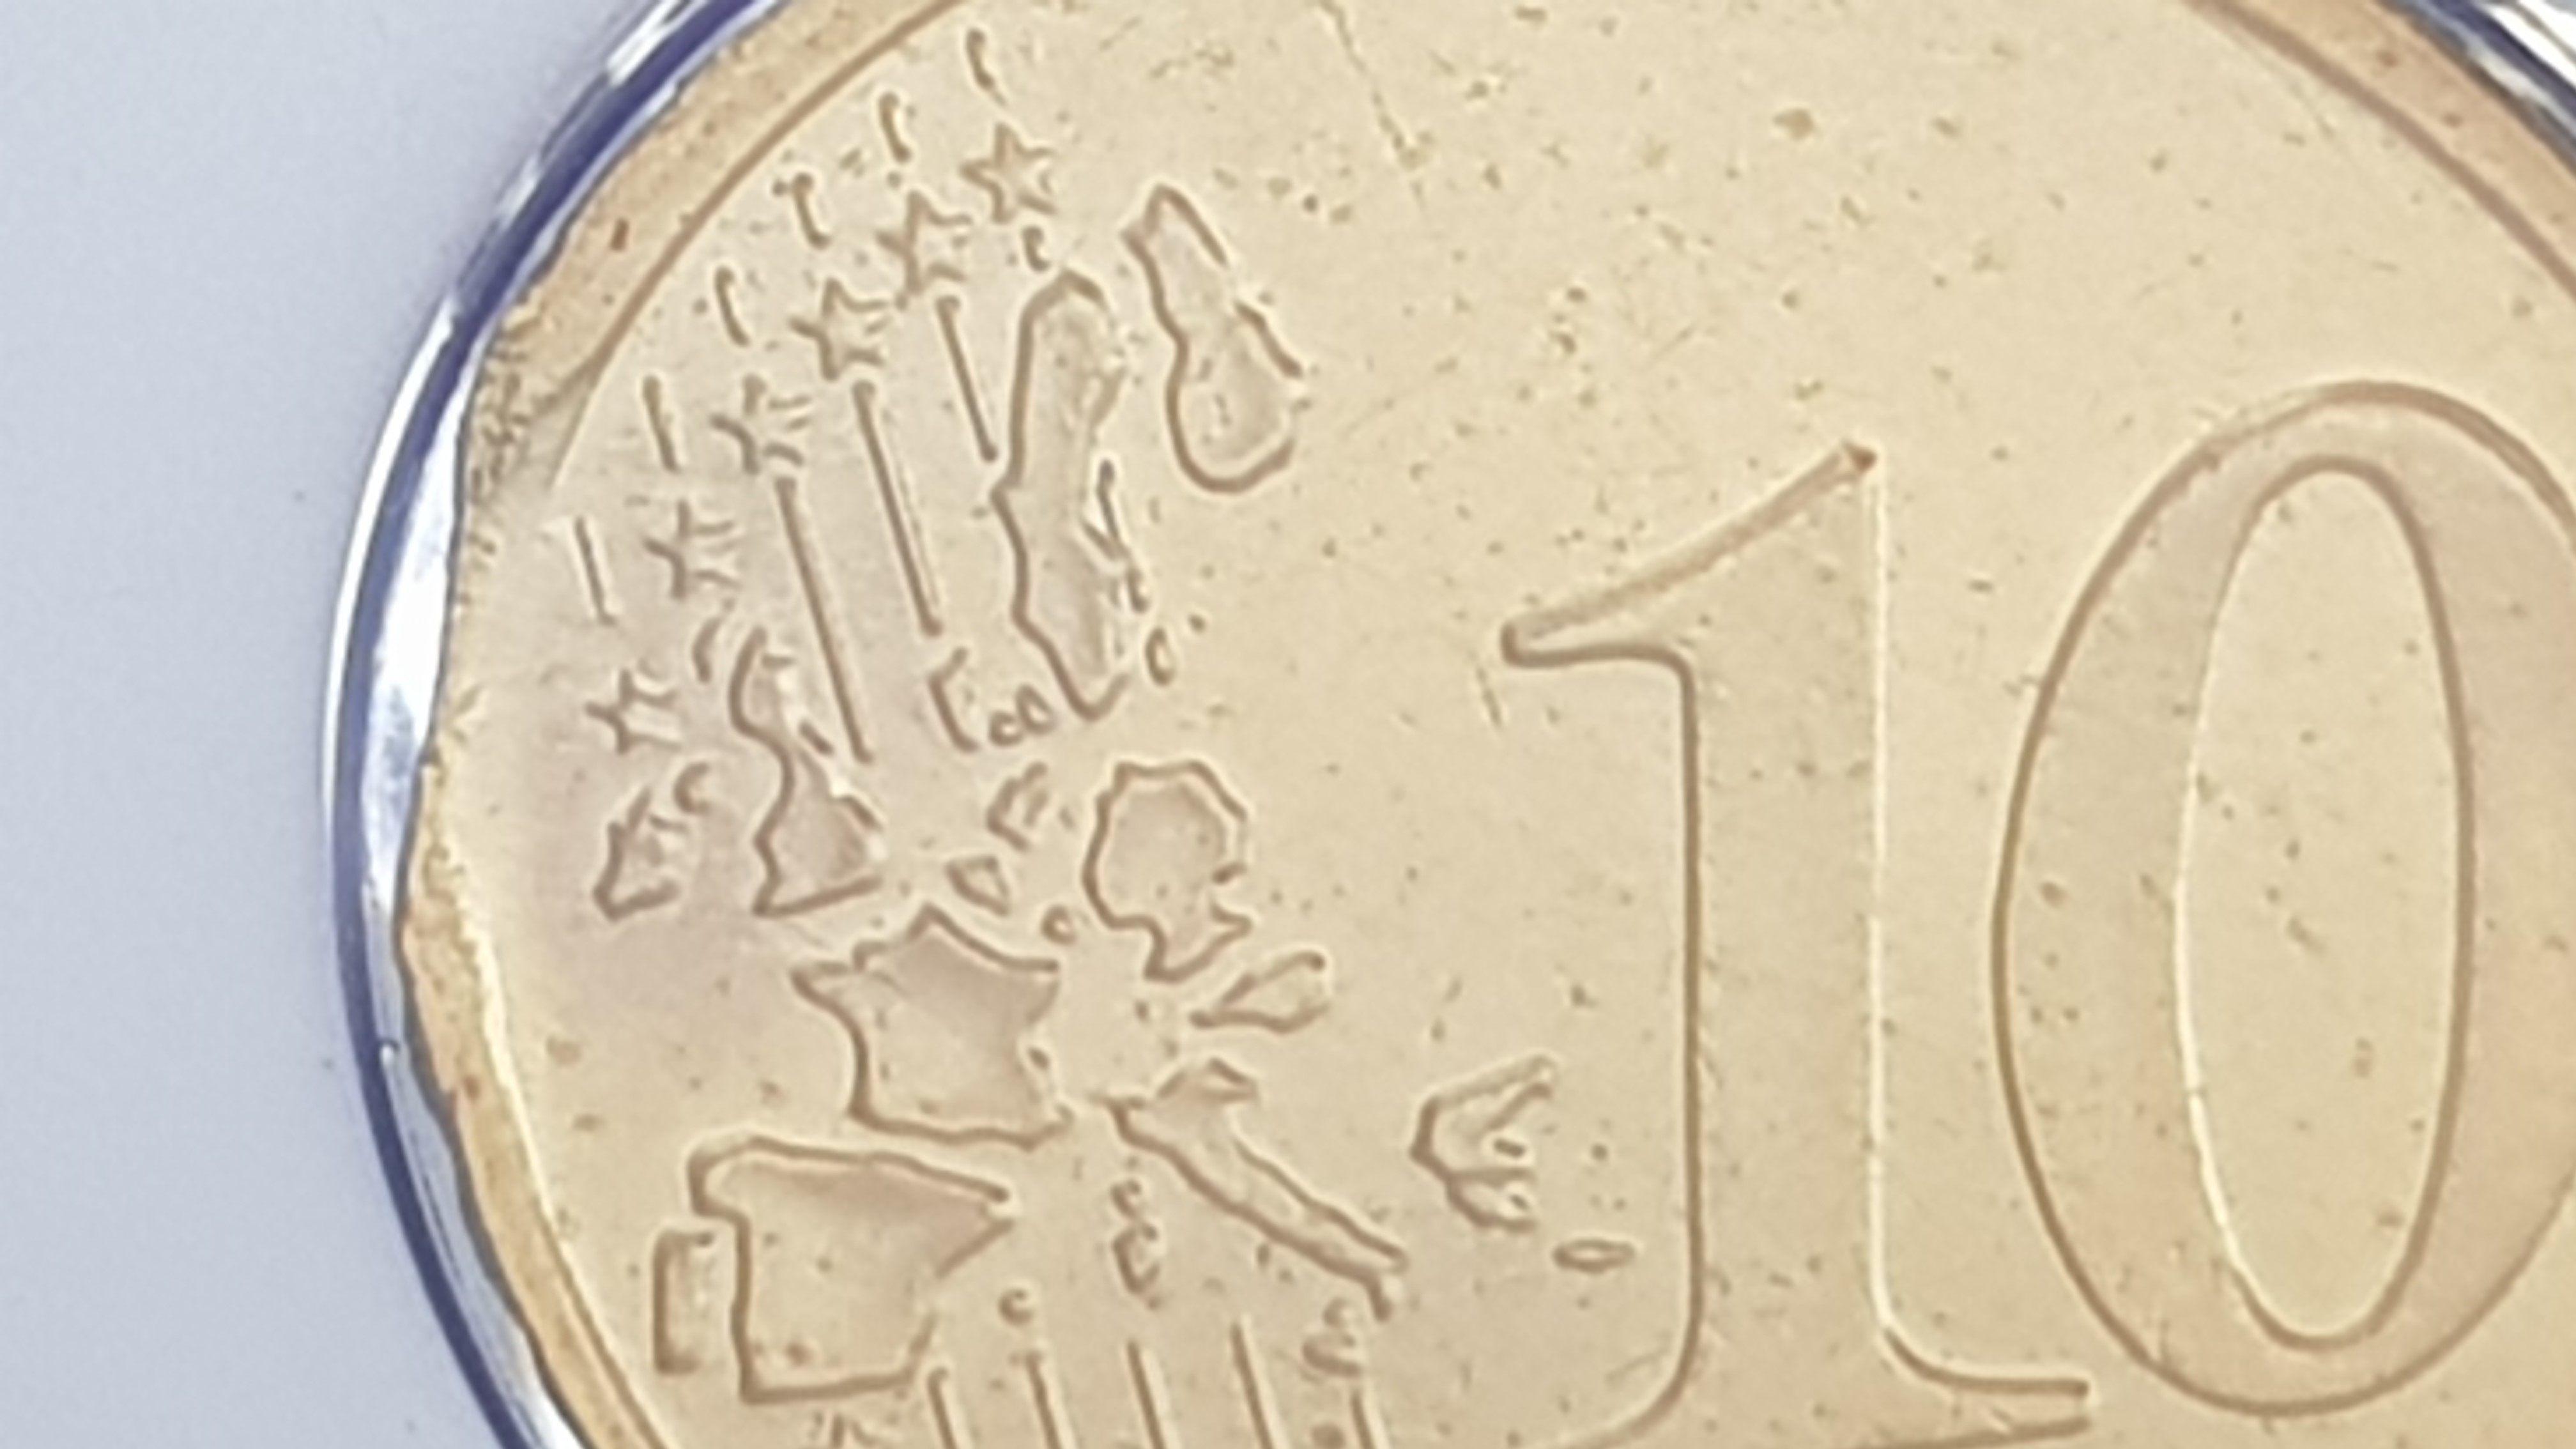 Irland 2002 10 Cent 005.jpg